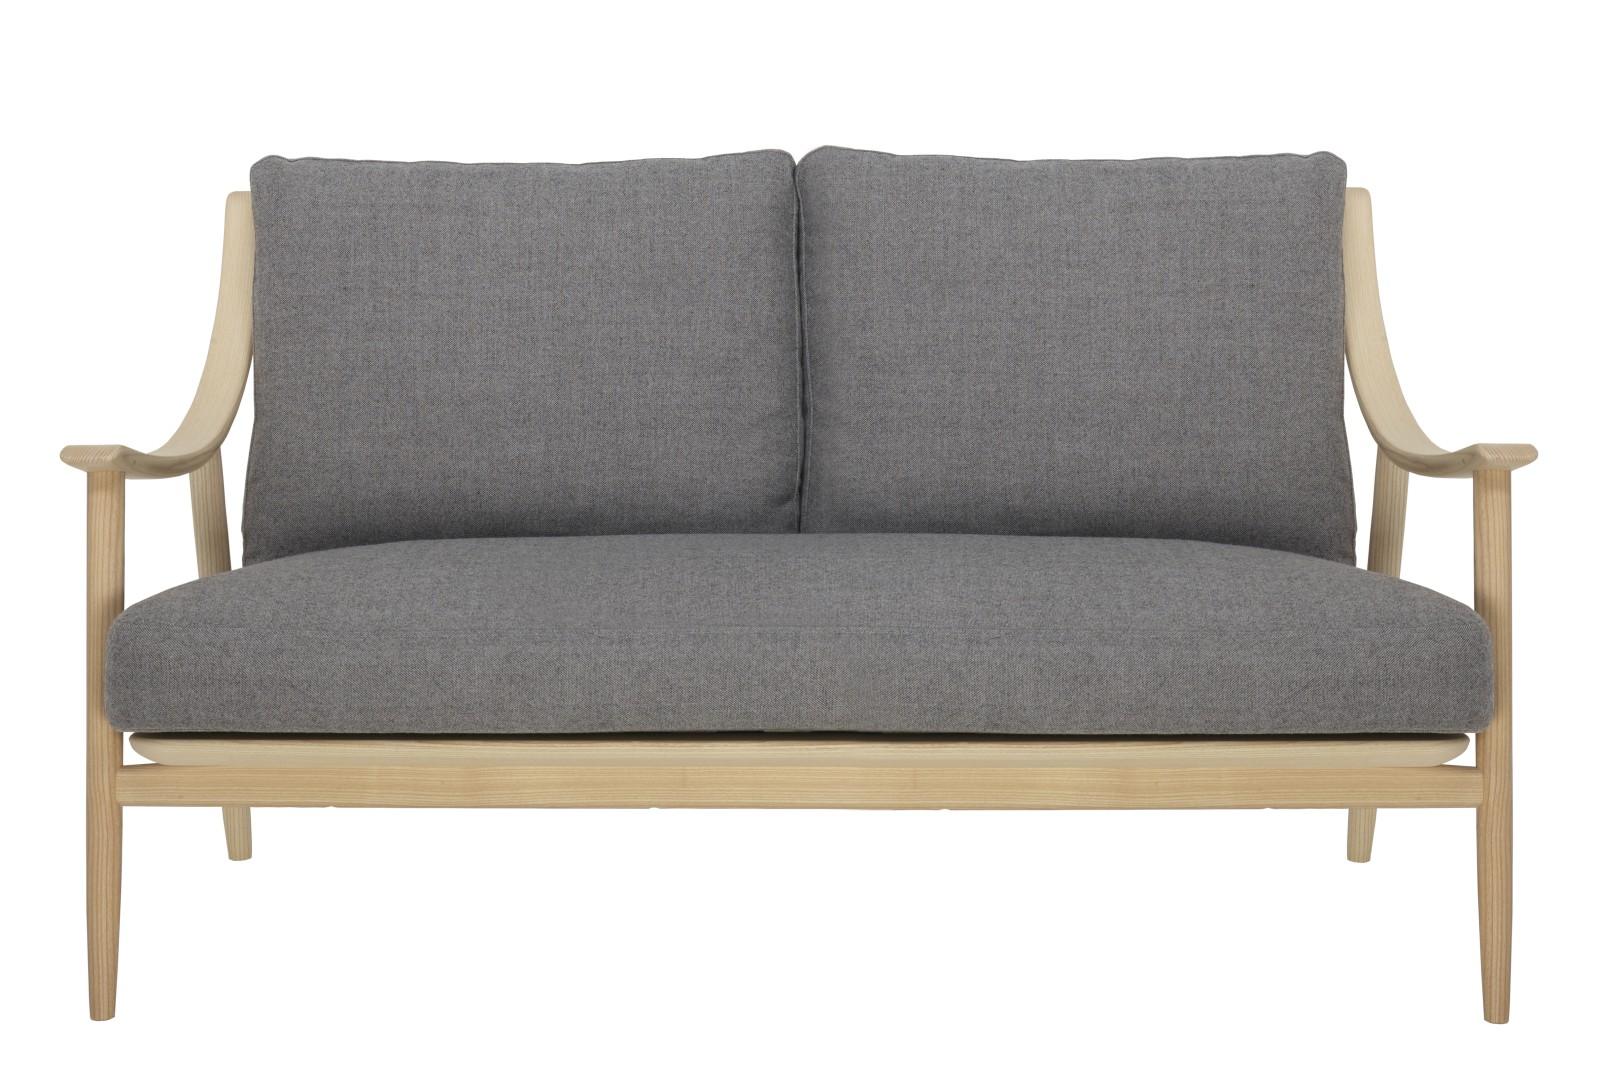 Marino 2 Seater Sofa Capture - J4001, Stains